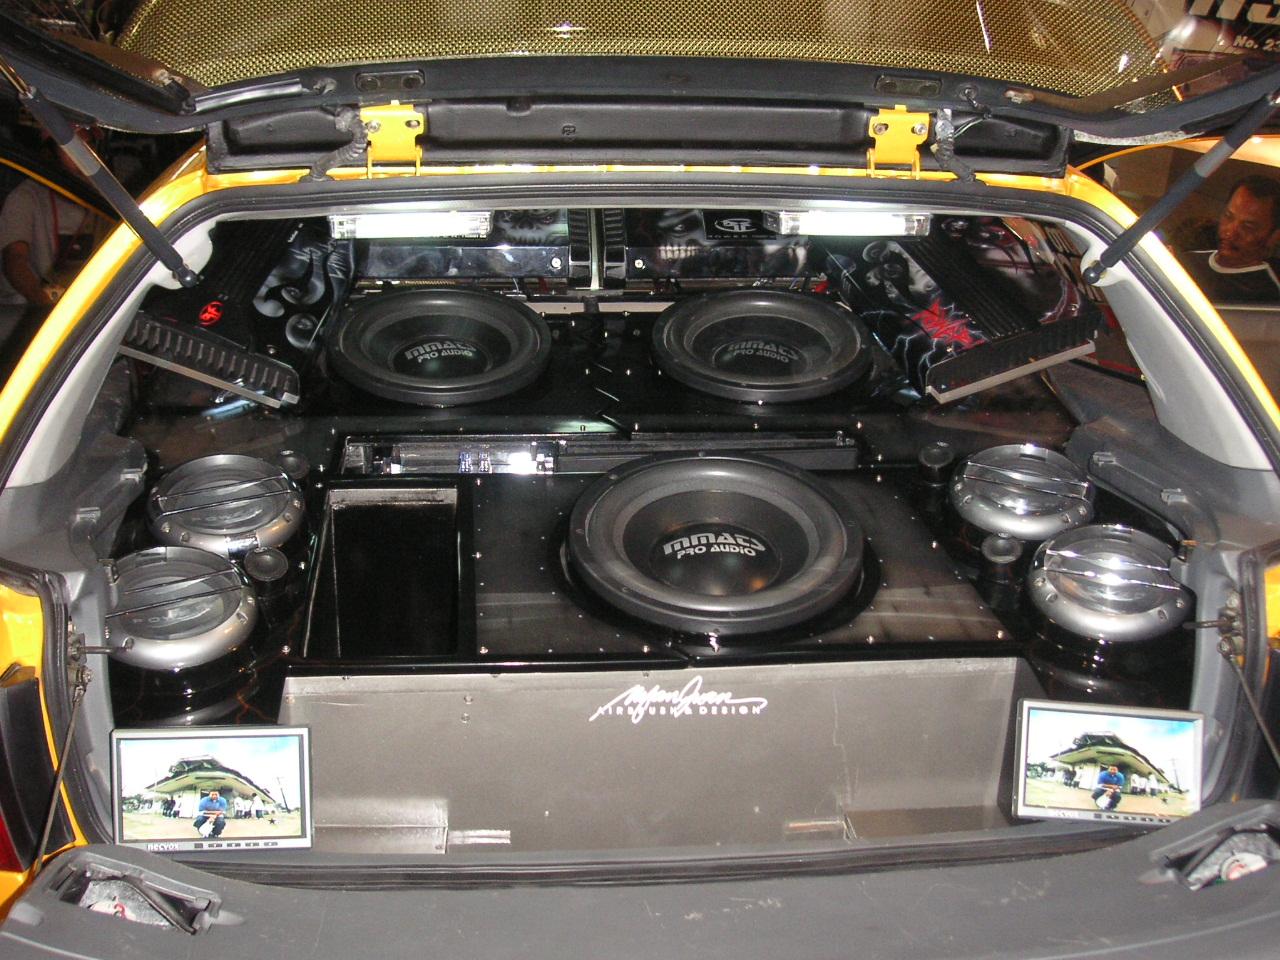 Best 8-inch Subwoofer Car Audio